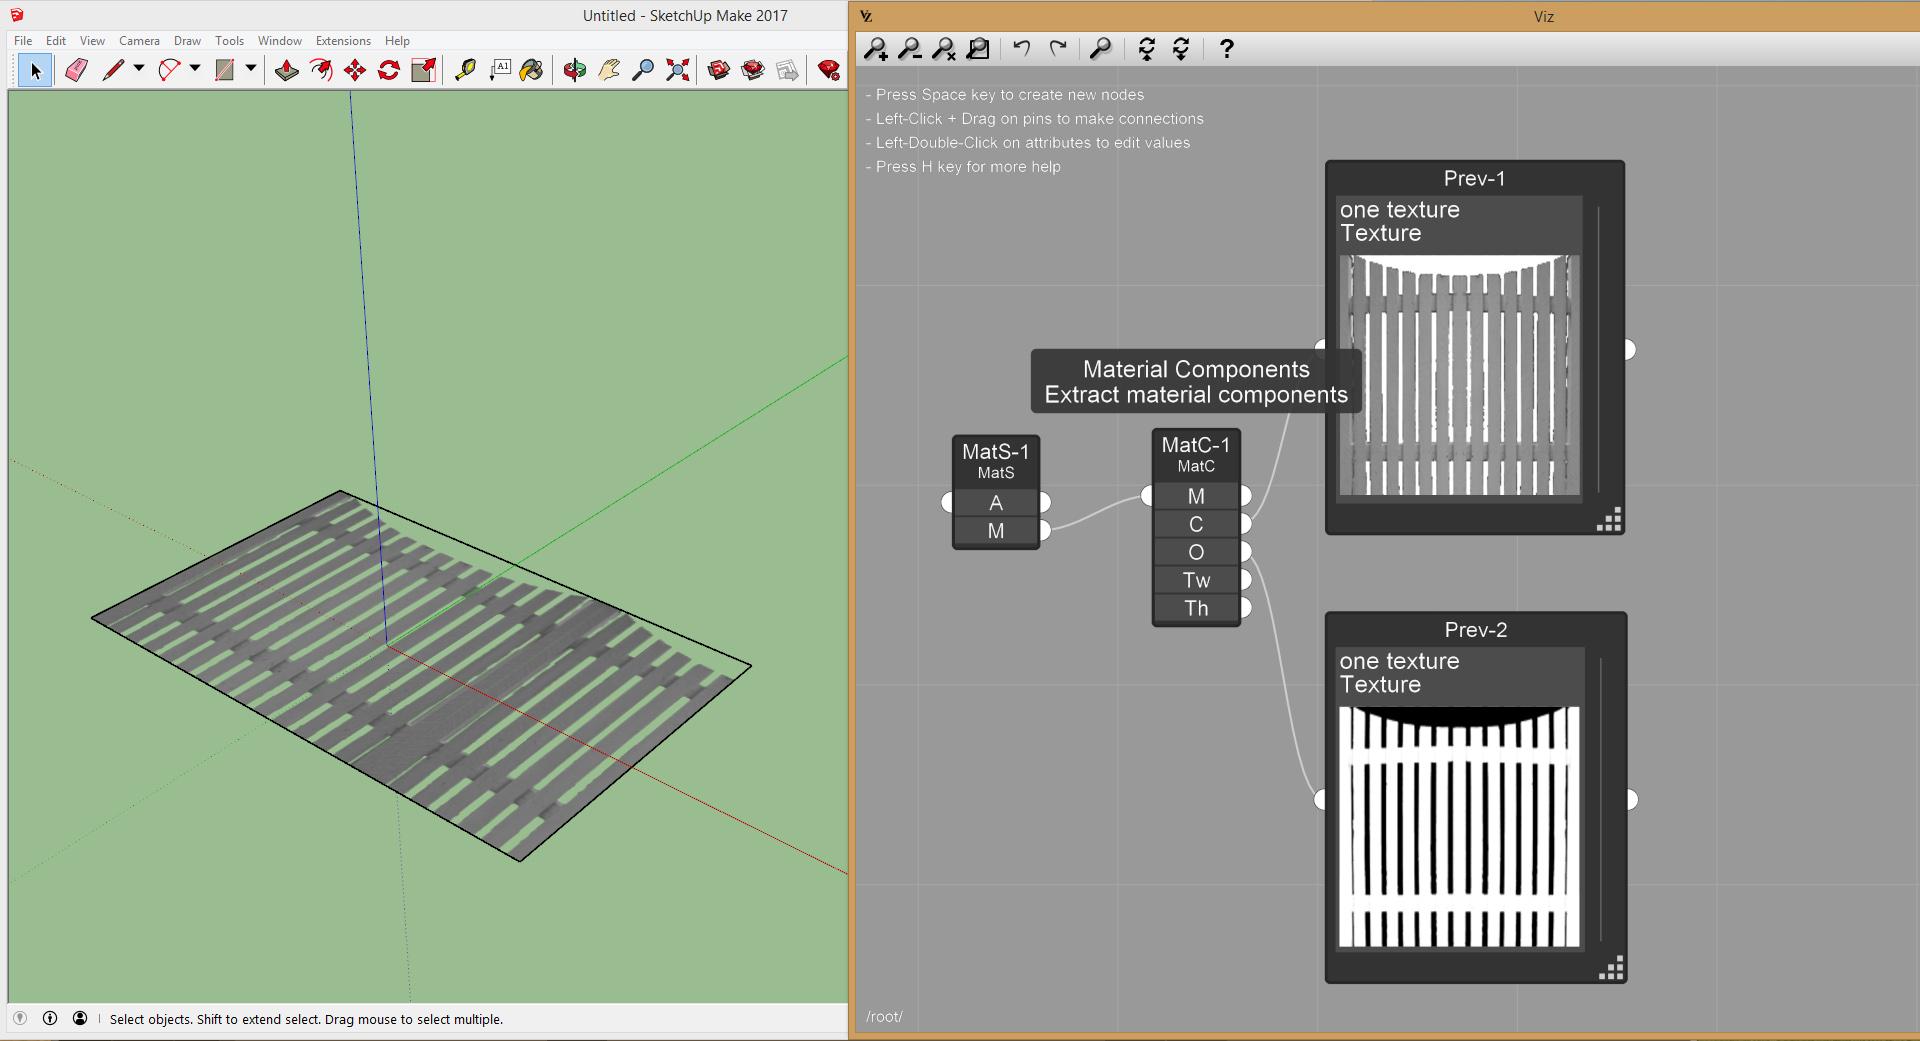 Viz Pro Material Components